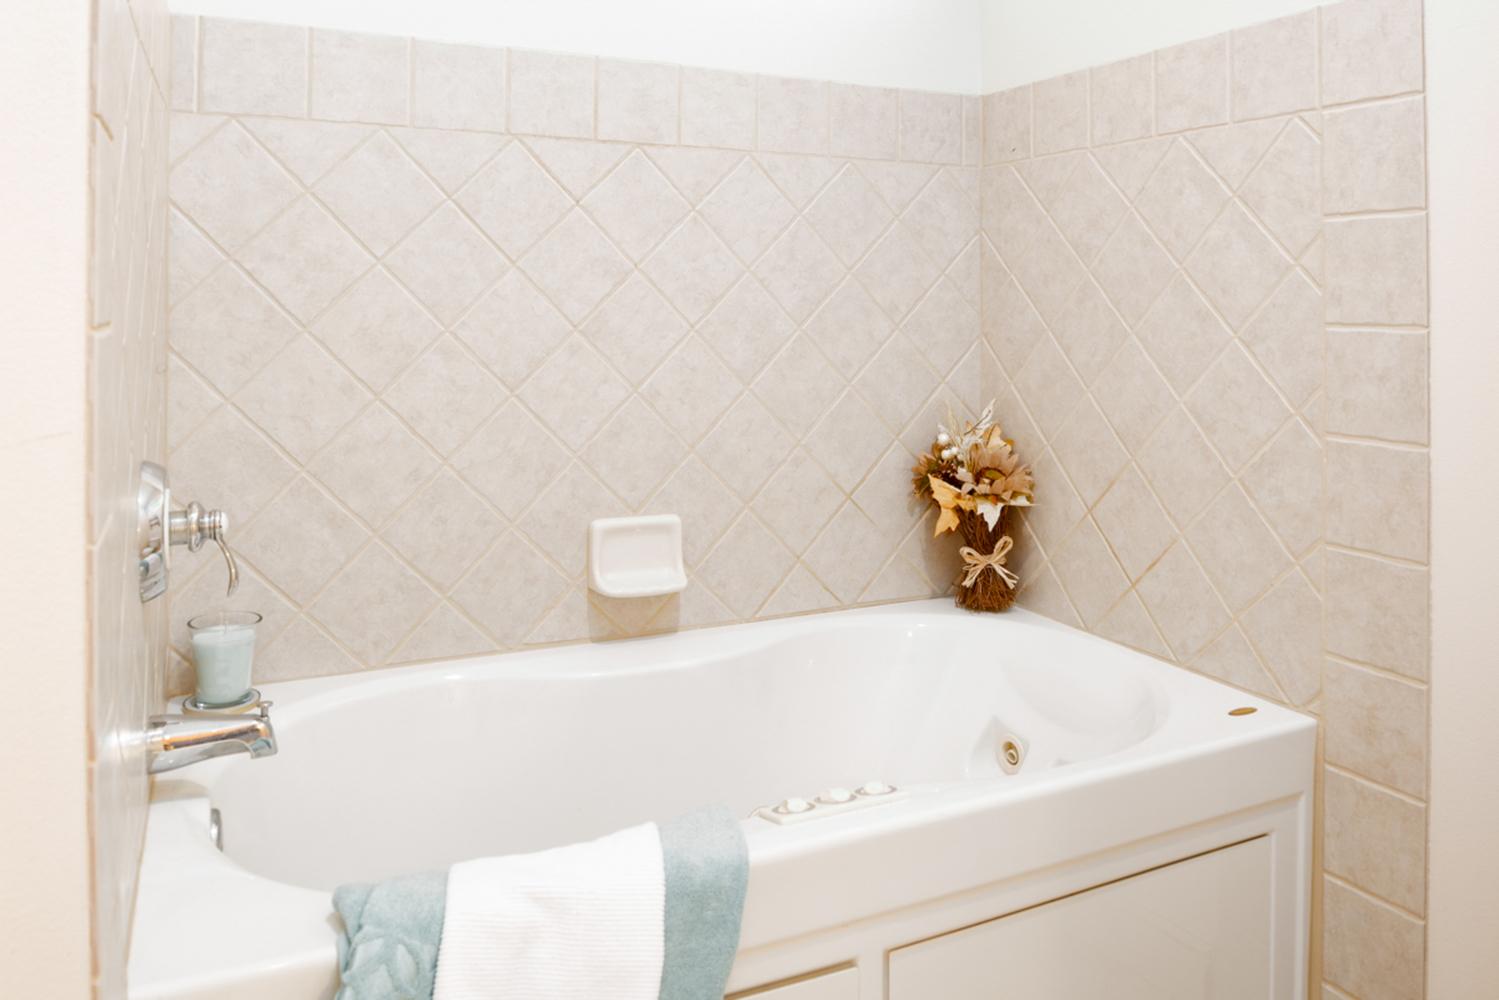 Puu lani main photos 29 master bathroom tub